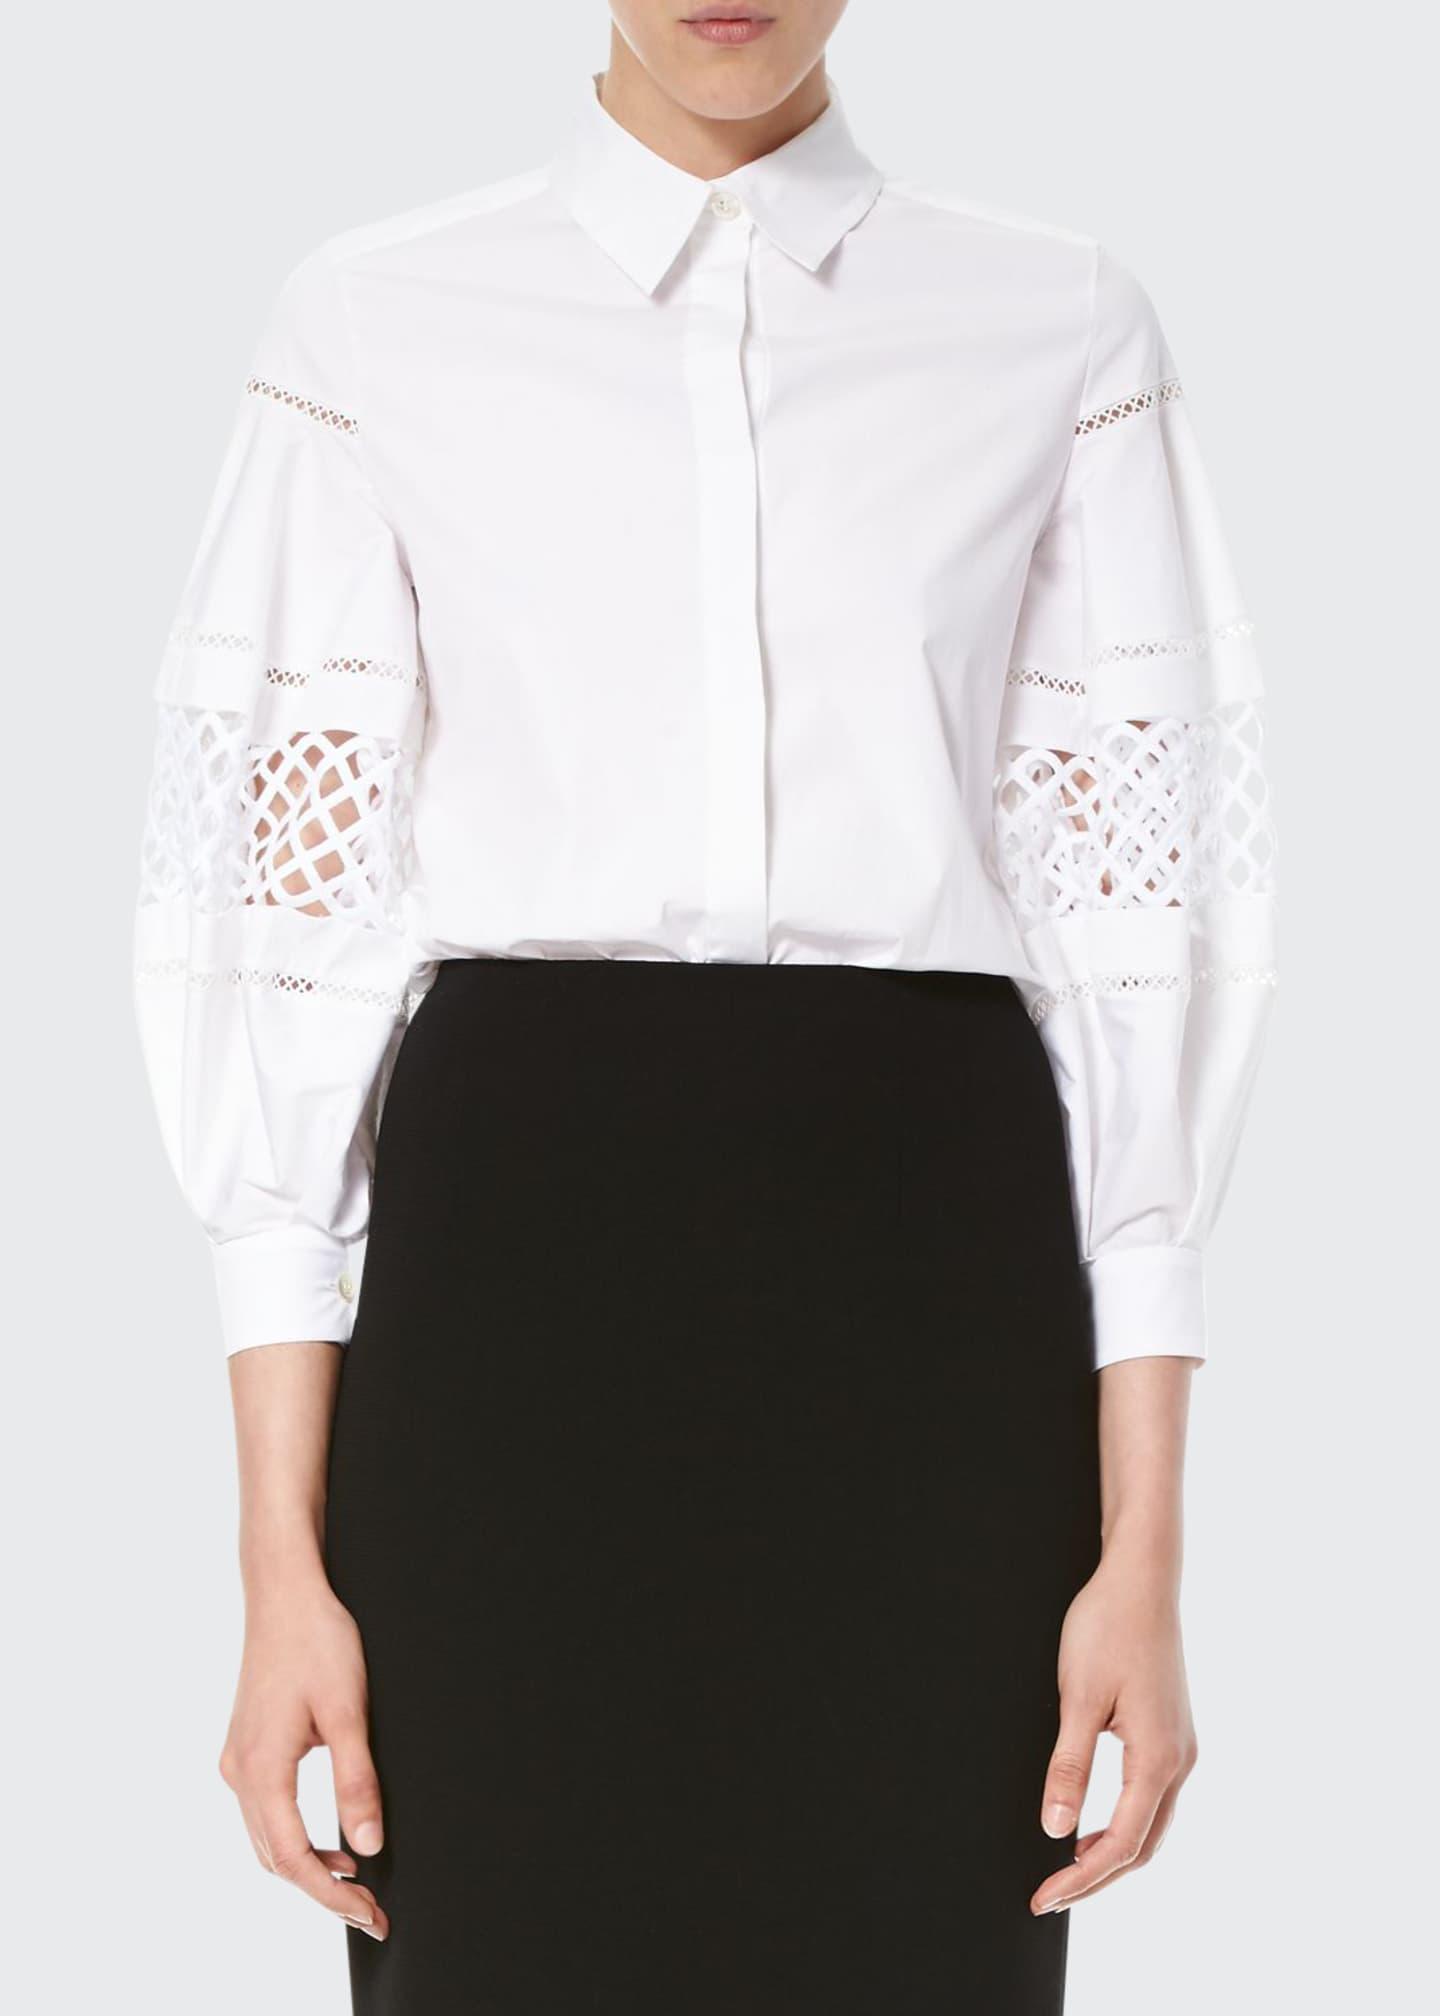 Carolina Herrera Crochet-Inset Balloon-Sleeve Blouse, White